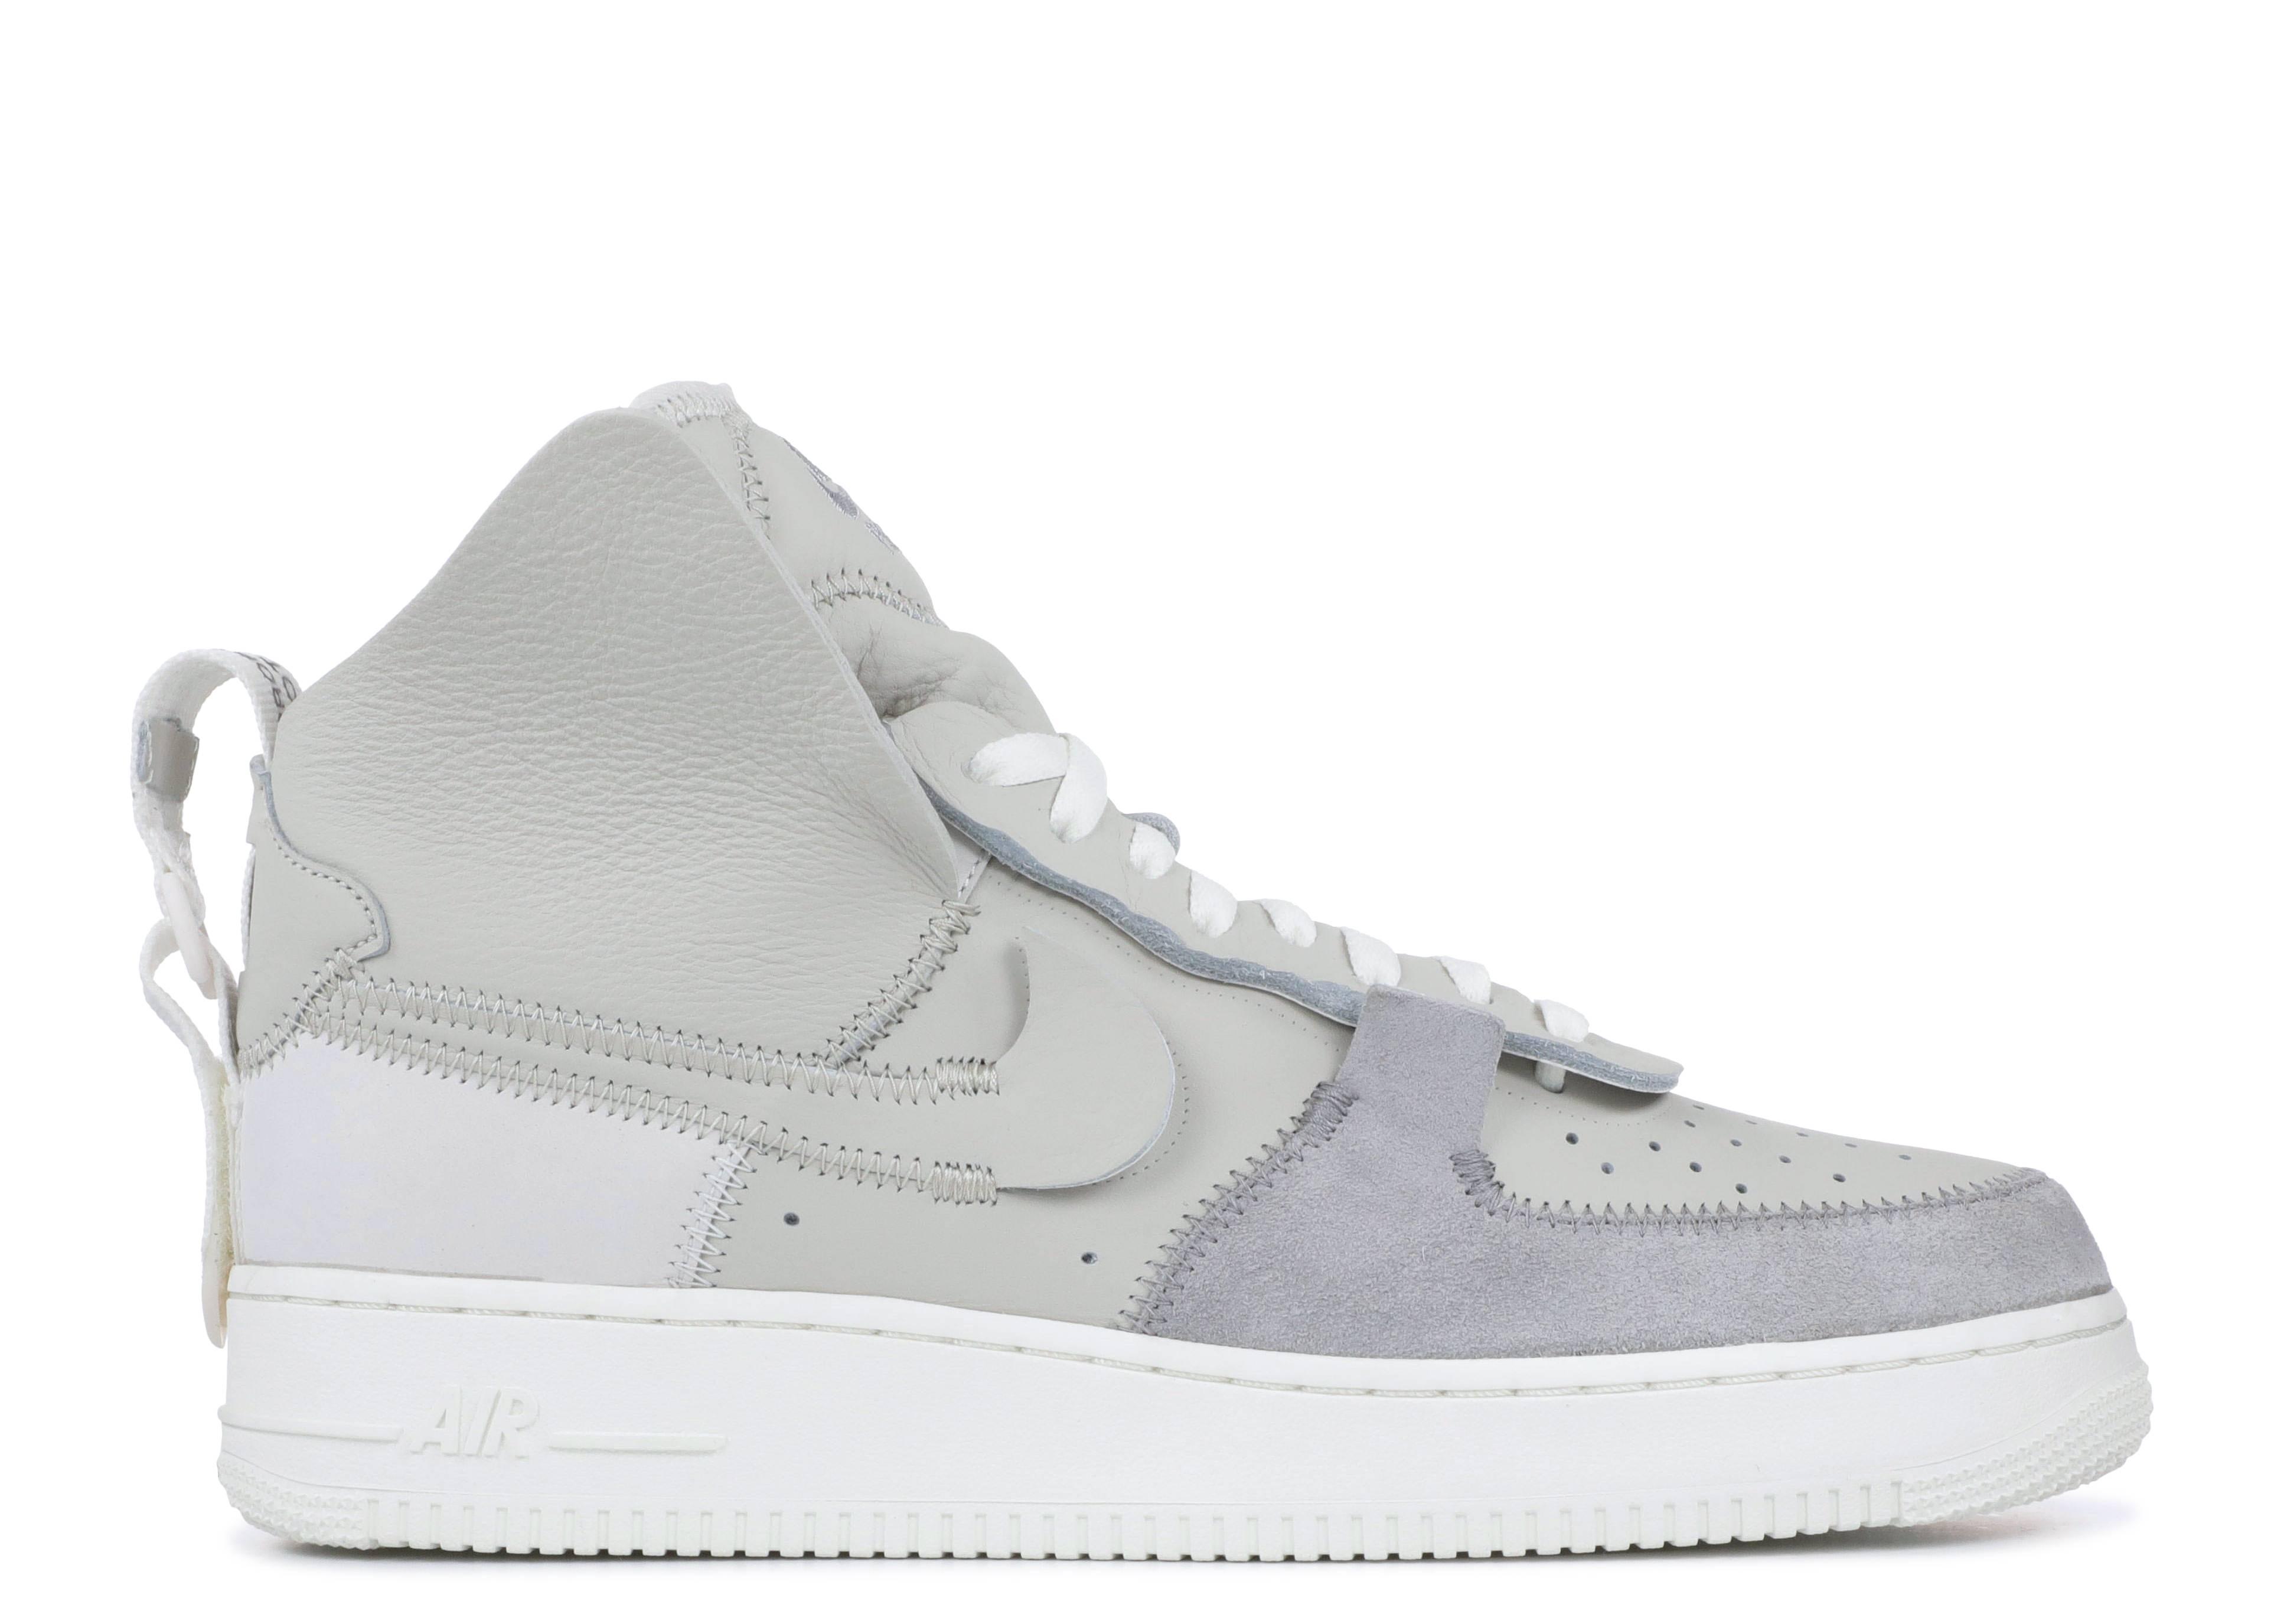 buy online bd9bf ae18f Air Force 1 High PSNY - Nike - AO9292 001 - matte silver light  bone-sail-white   Flight Club